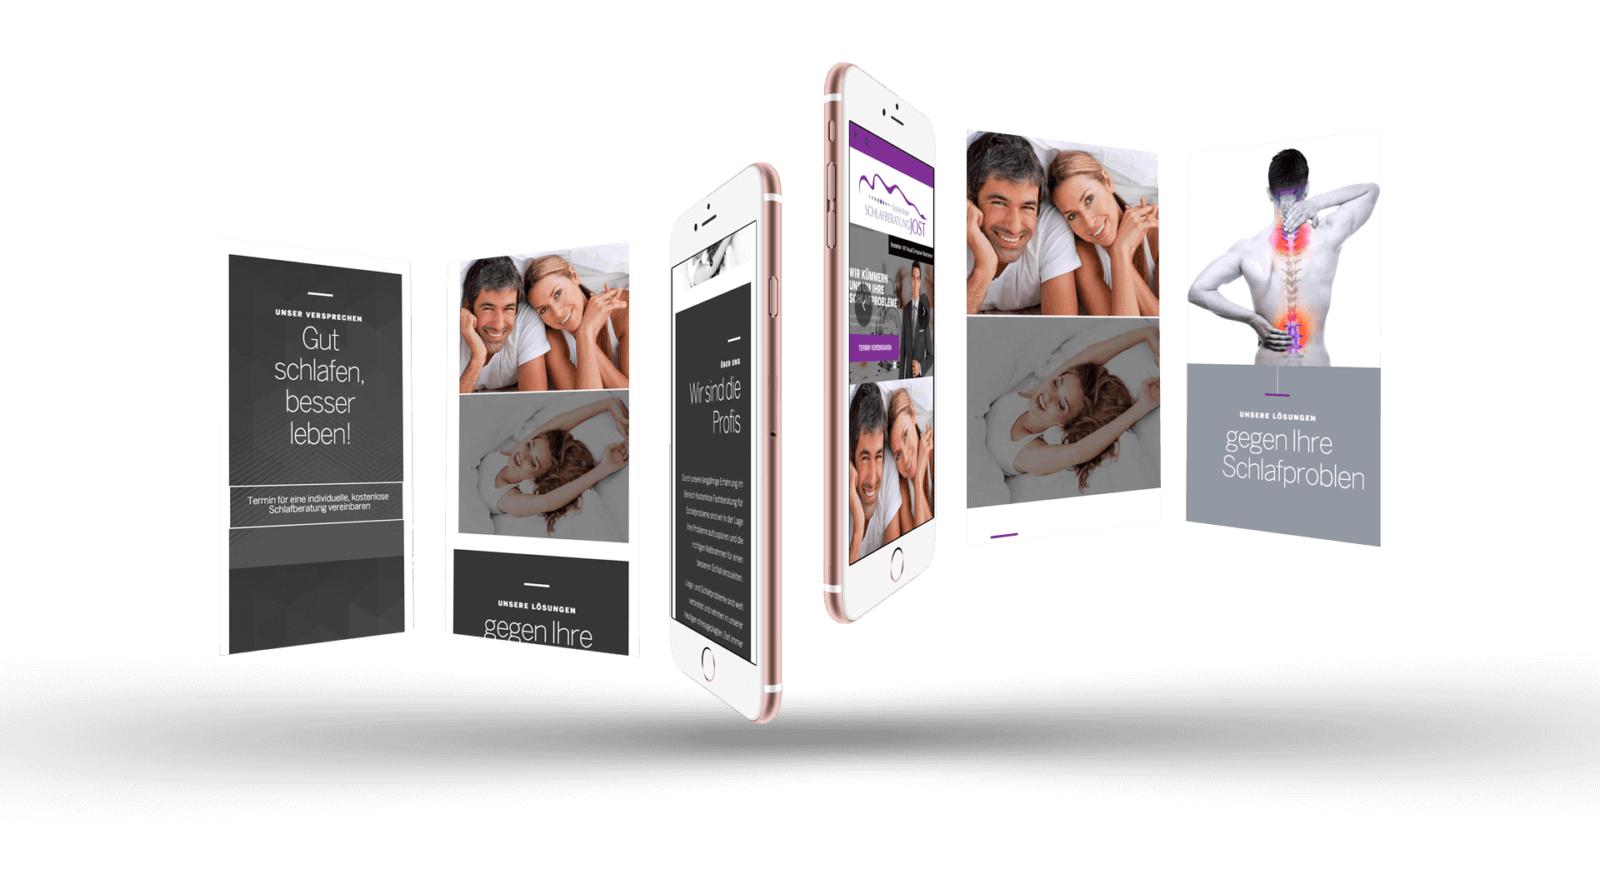 schlafberatung-iphone-all